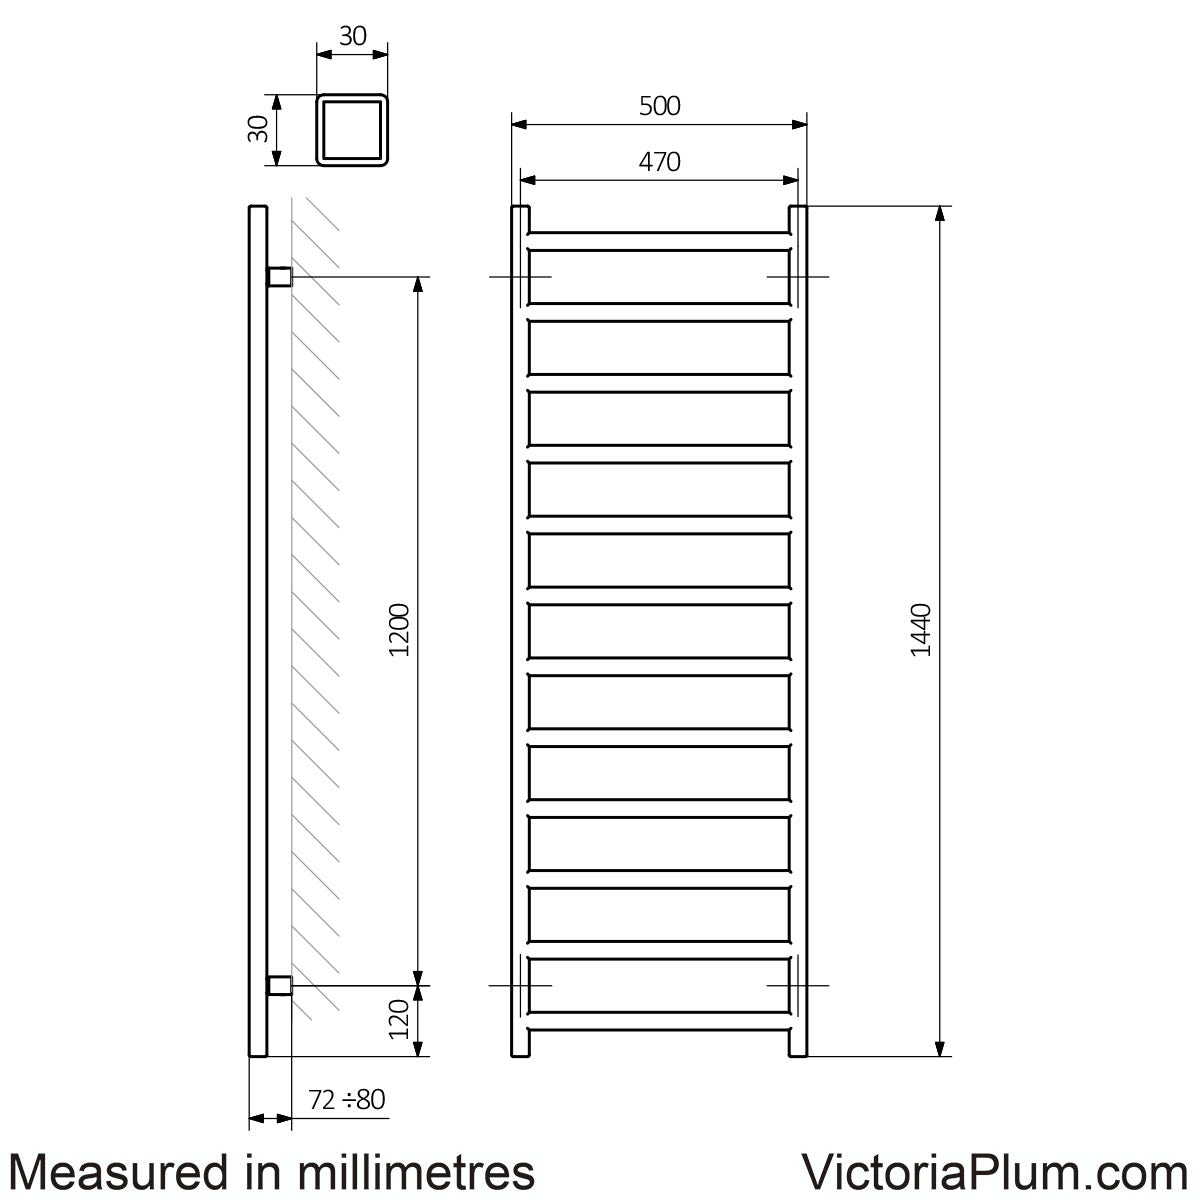 Dimensions for Terma Simple meteor black heated towel rail 1440 x 500